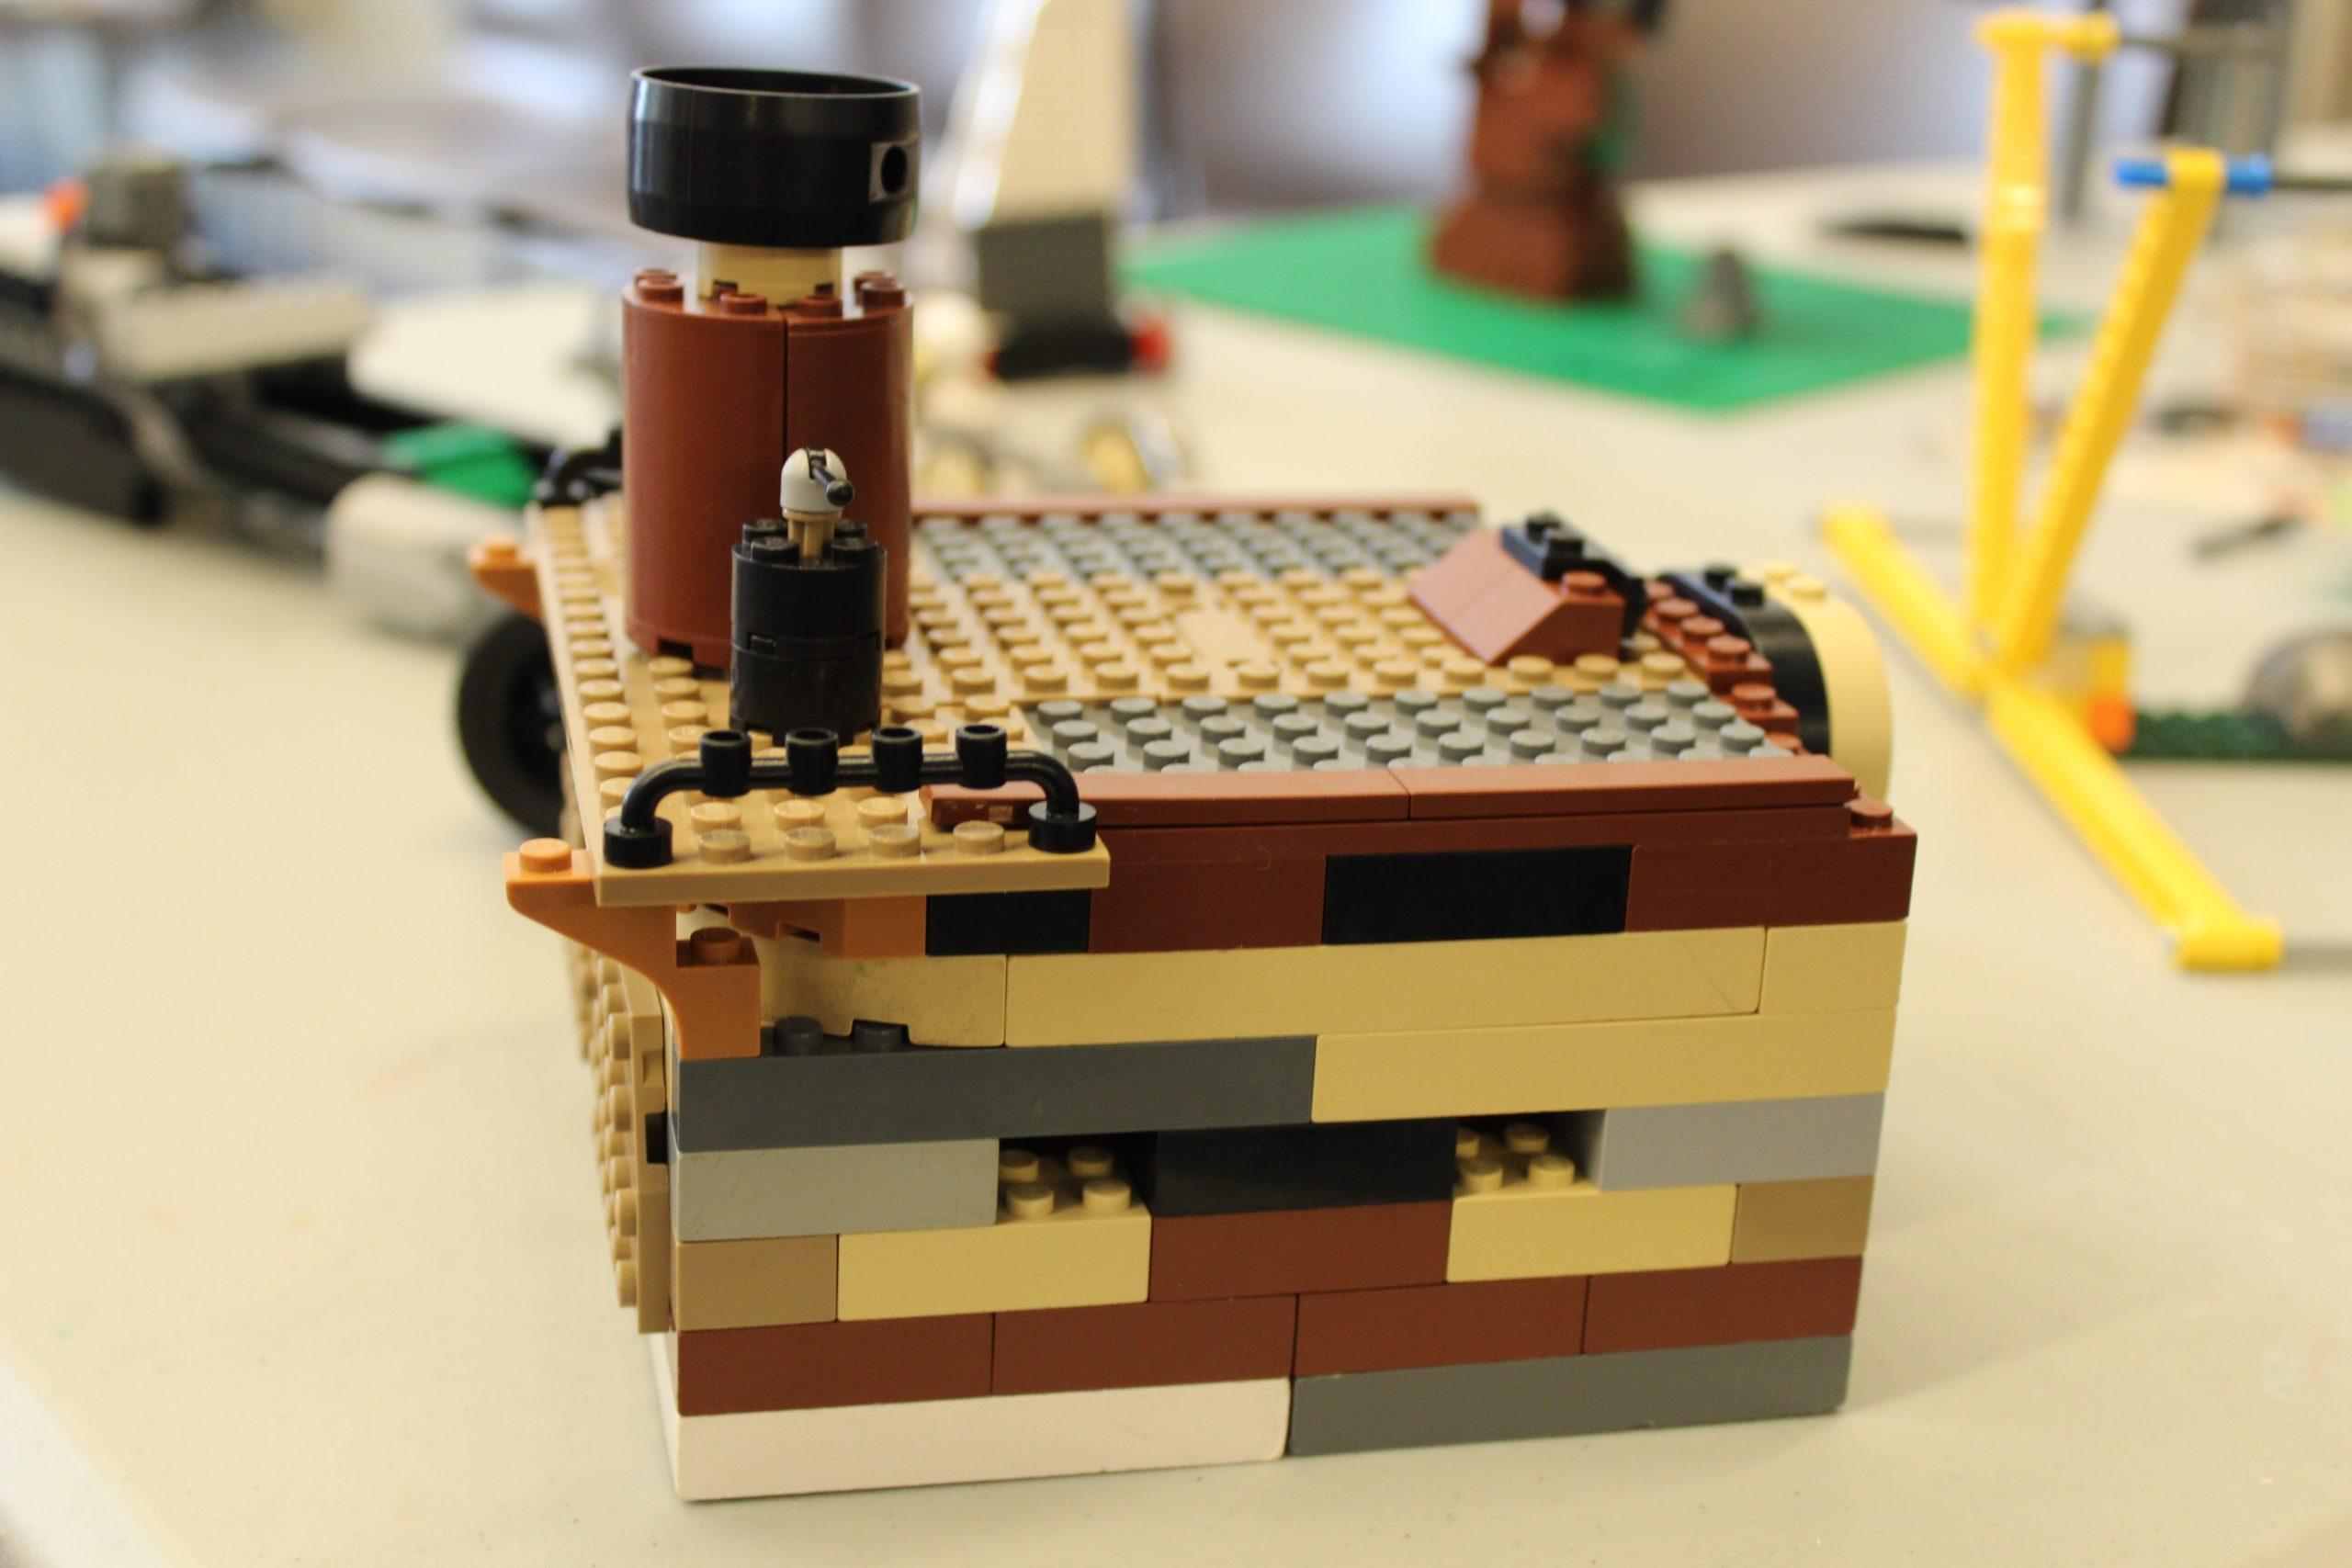 Pokémon Master Engineering using LEGO® Materials